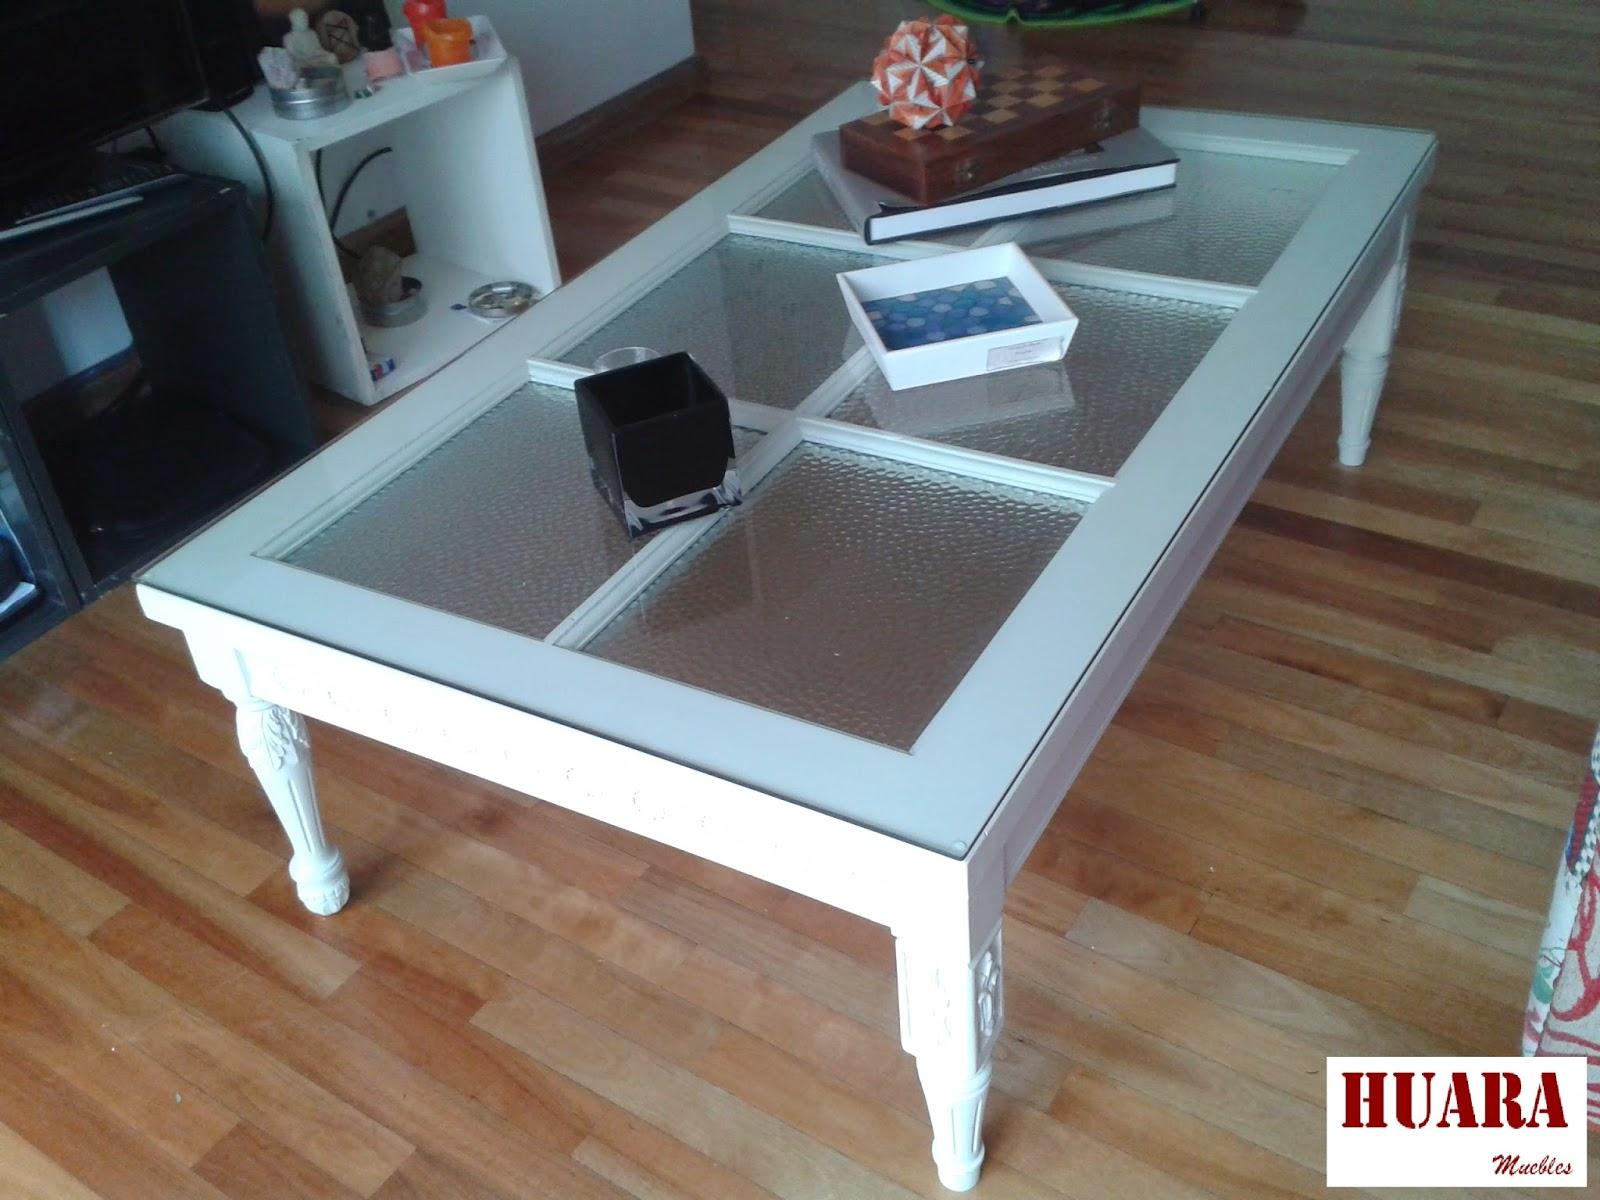 Huara muebles mesa ratona de madera reciclada - Mesas antiguas de cocina ...